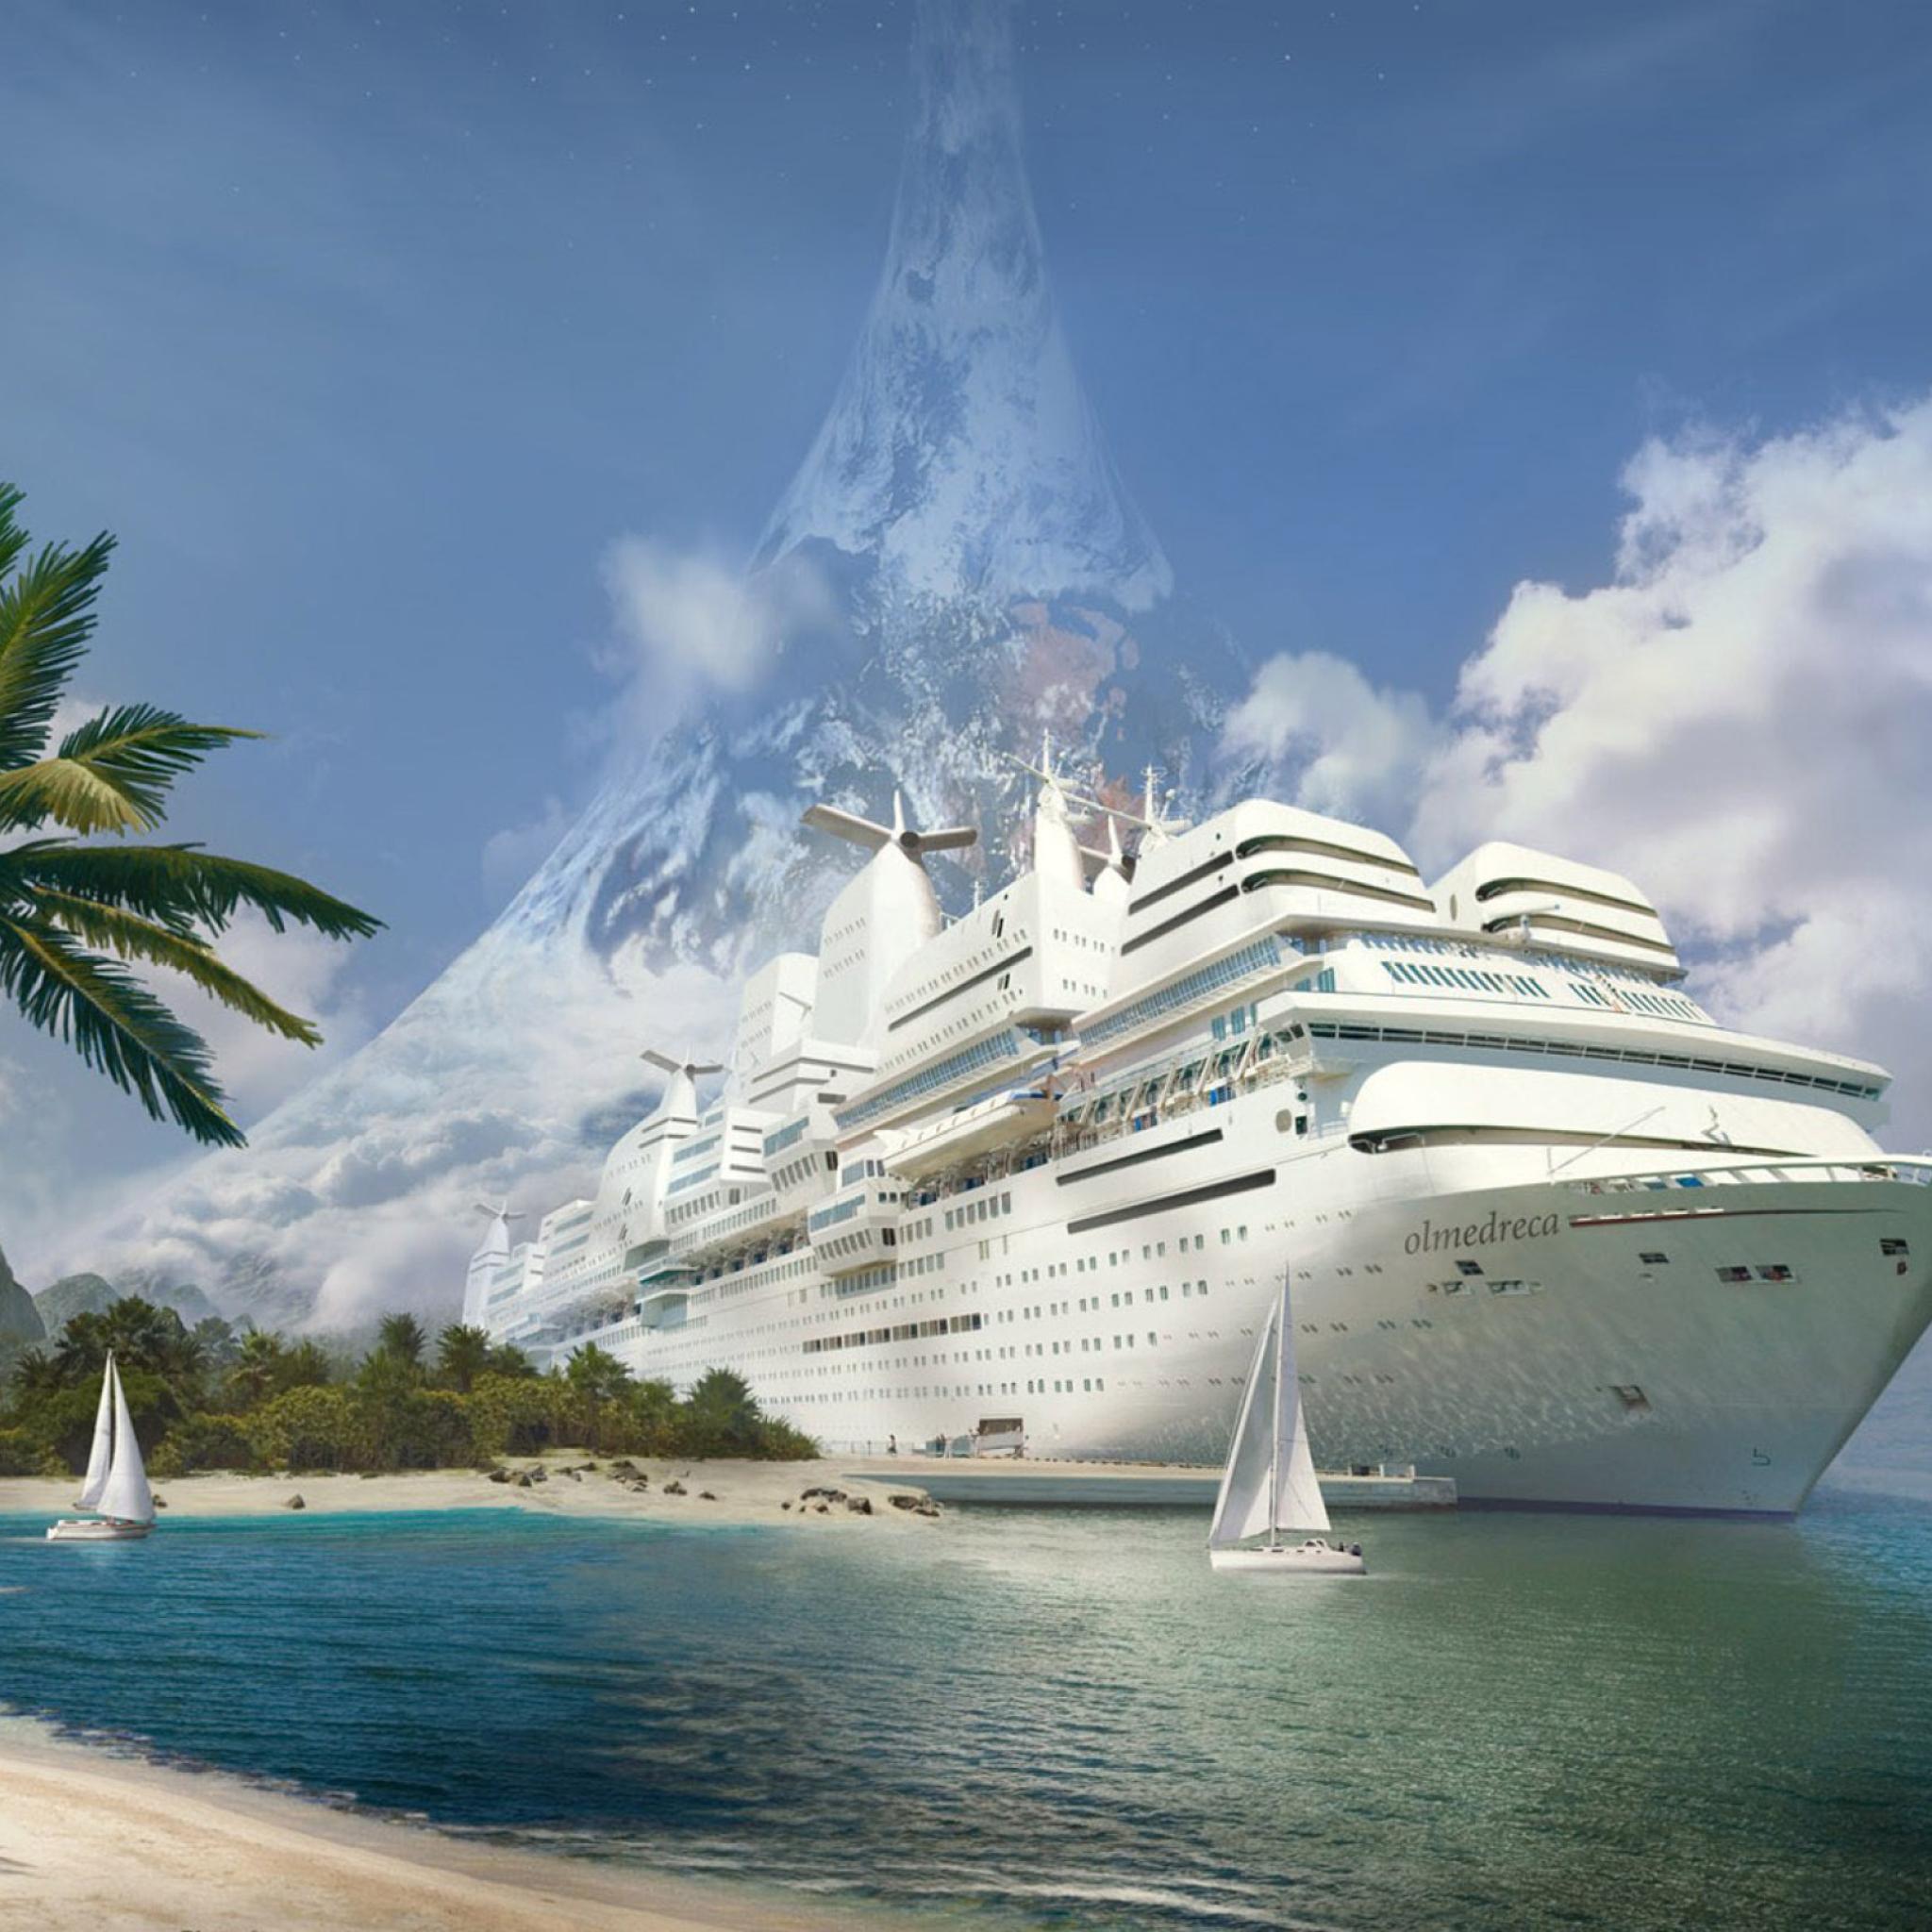 Point Reyes корабль на берегу скачать